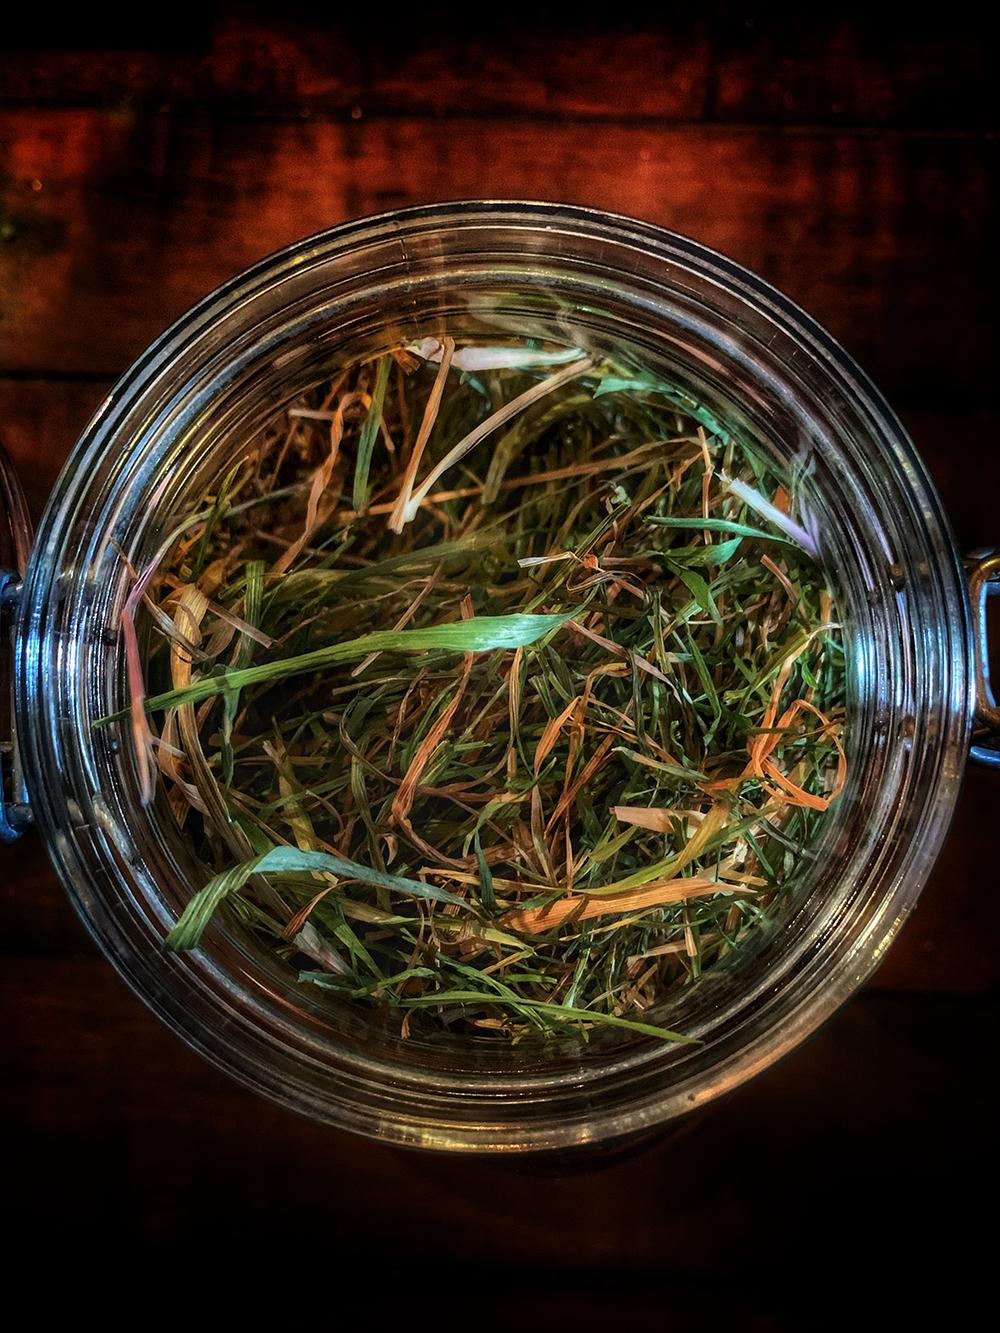 Sweetgrass witchcraft